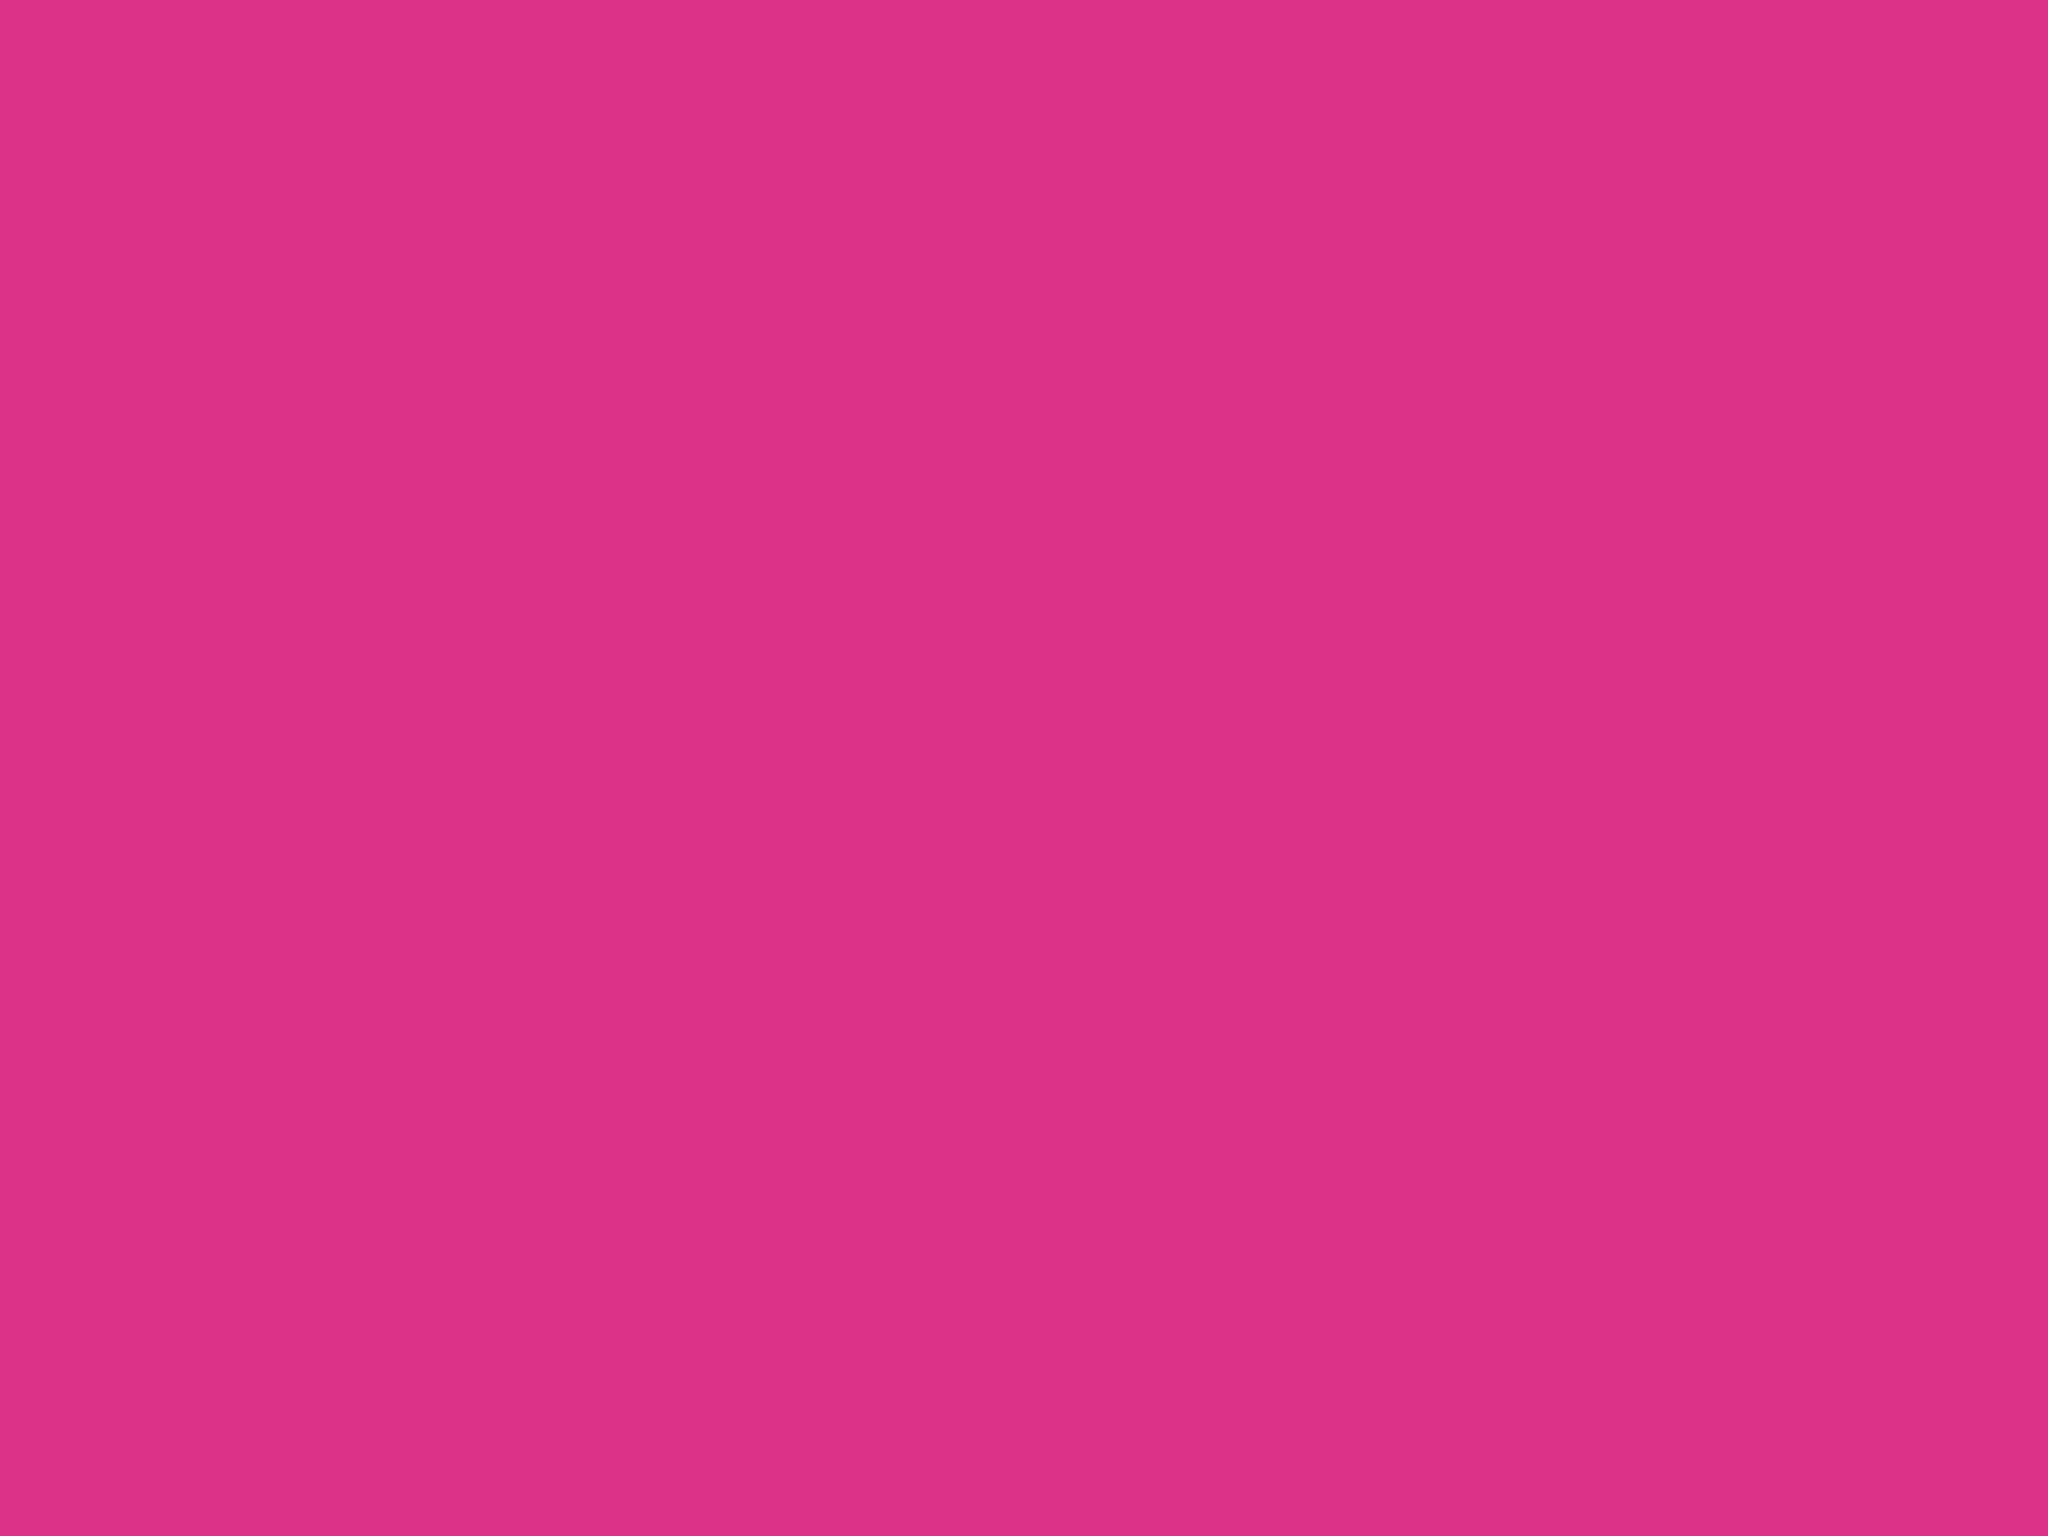 2048x1536 Deep Cerise Solid Color Background